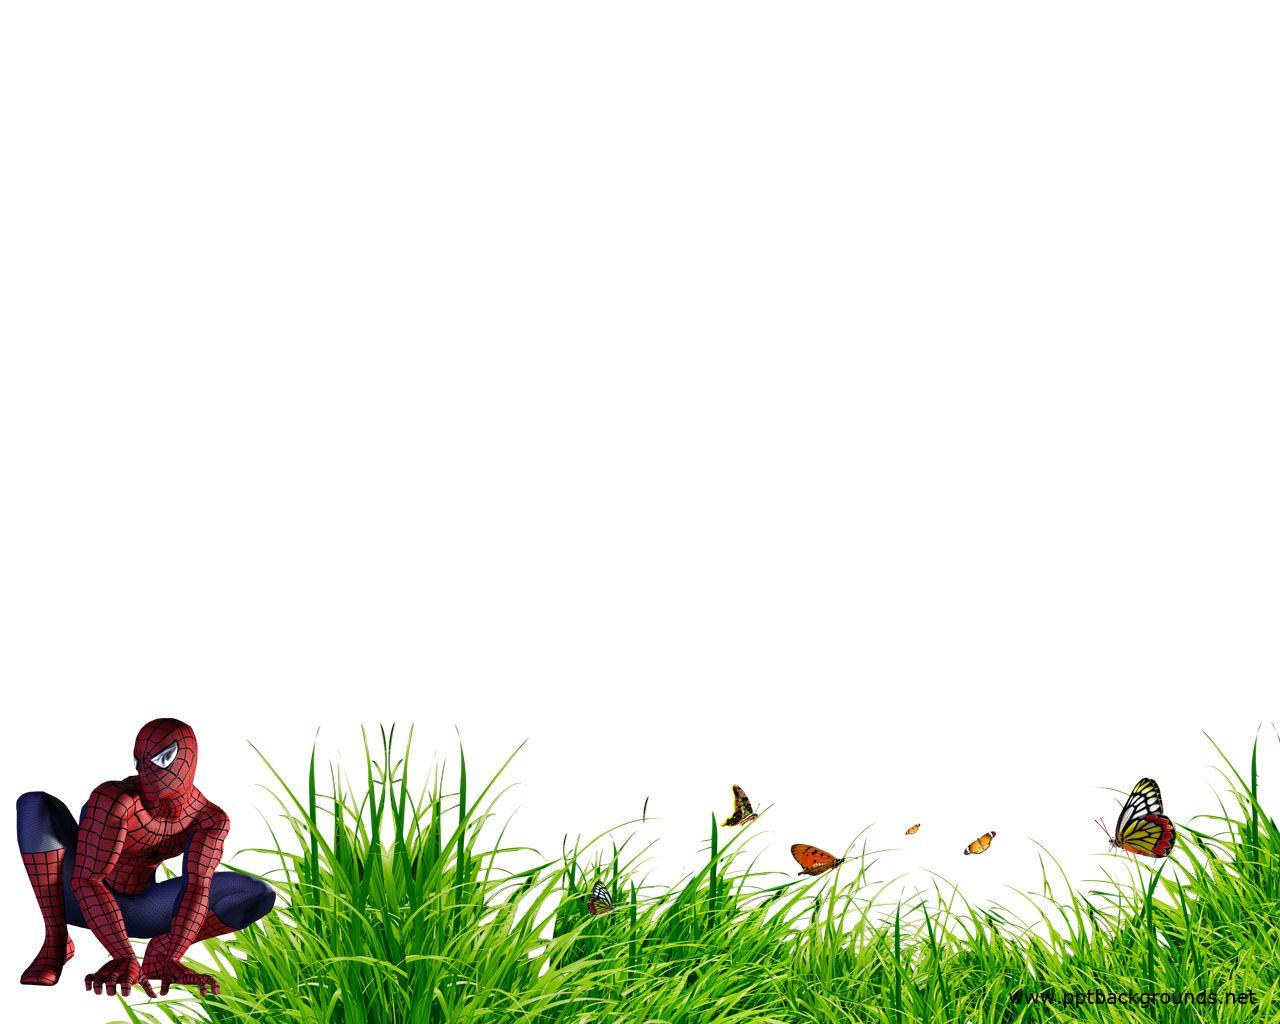 superhero borders template Spiderman Backgrounds for